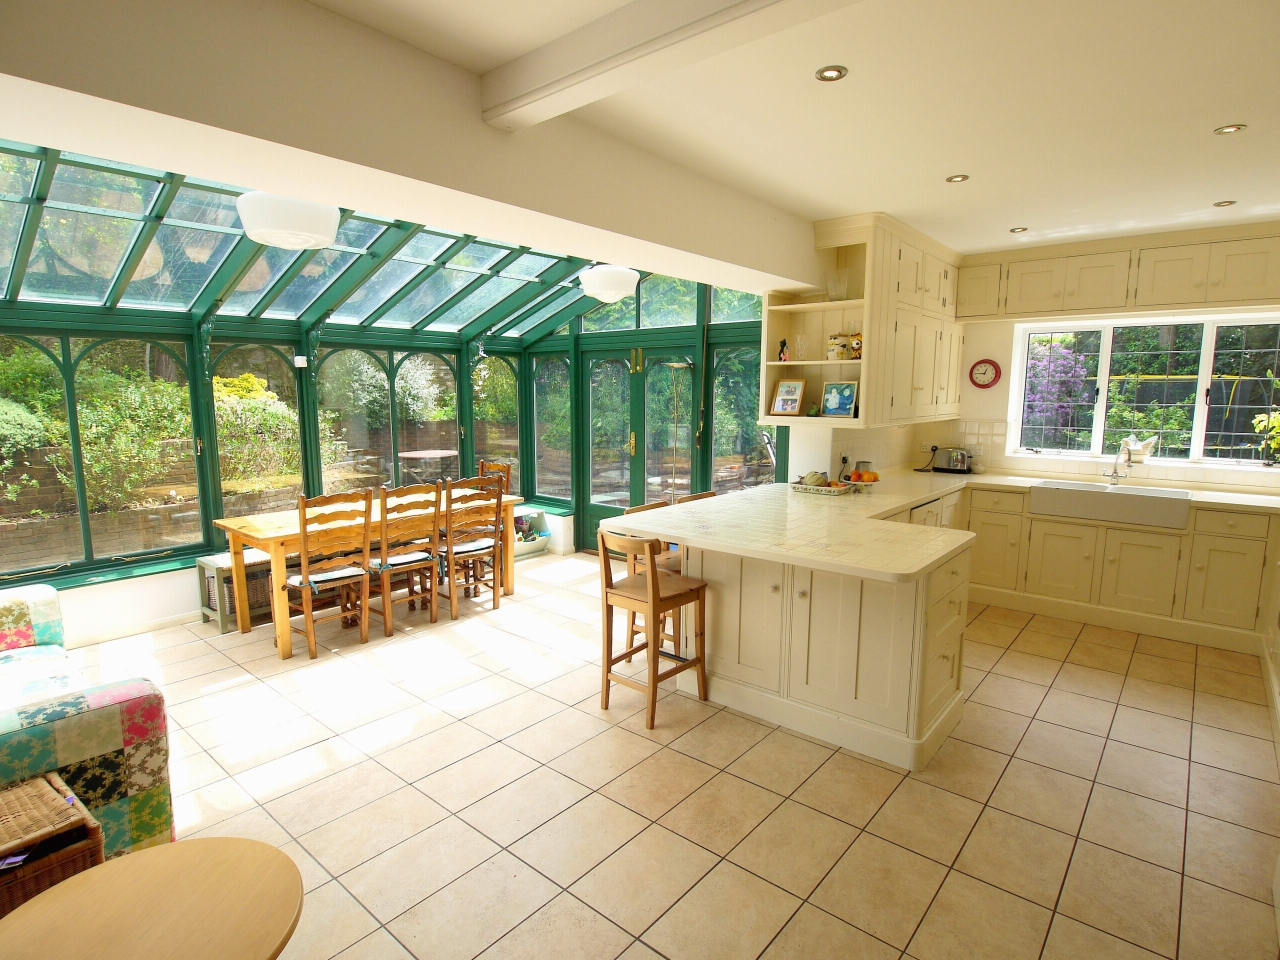 6 bedroom detached house Sold in Sevenoaks - Photograph 5